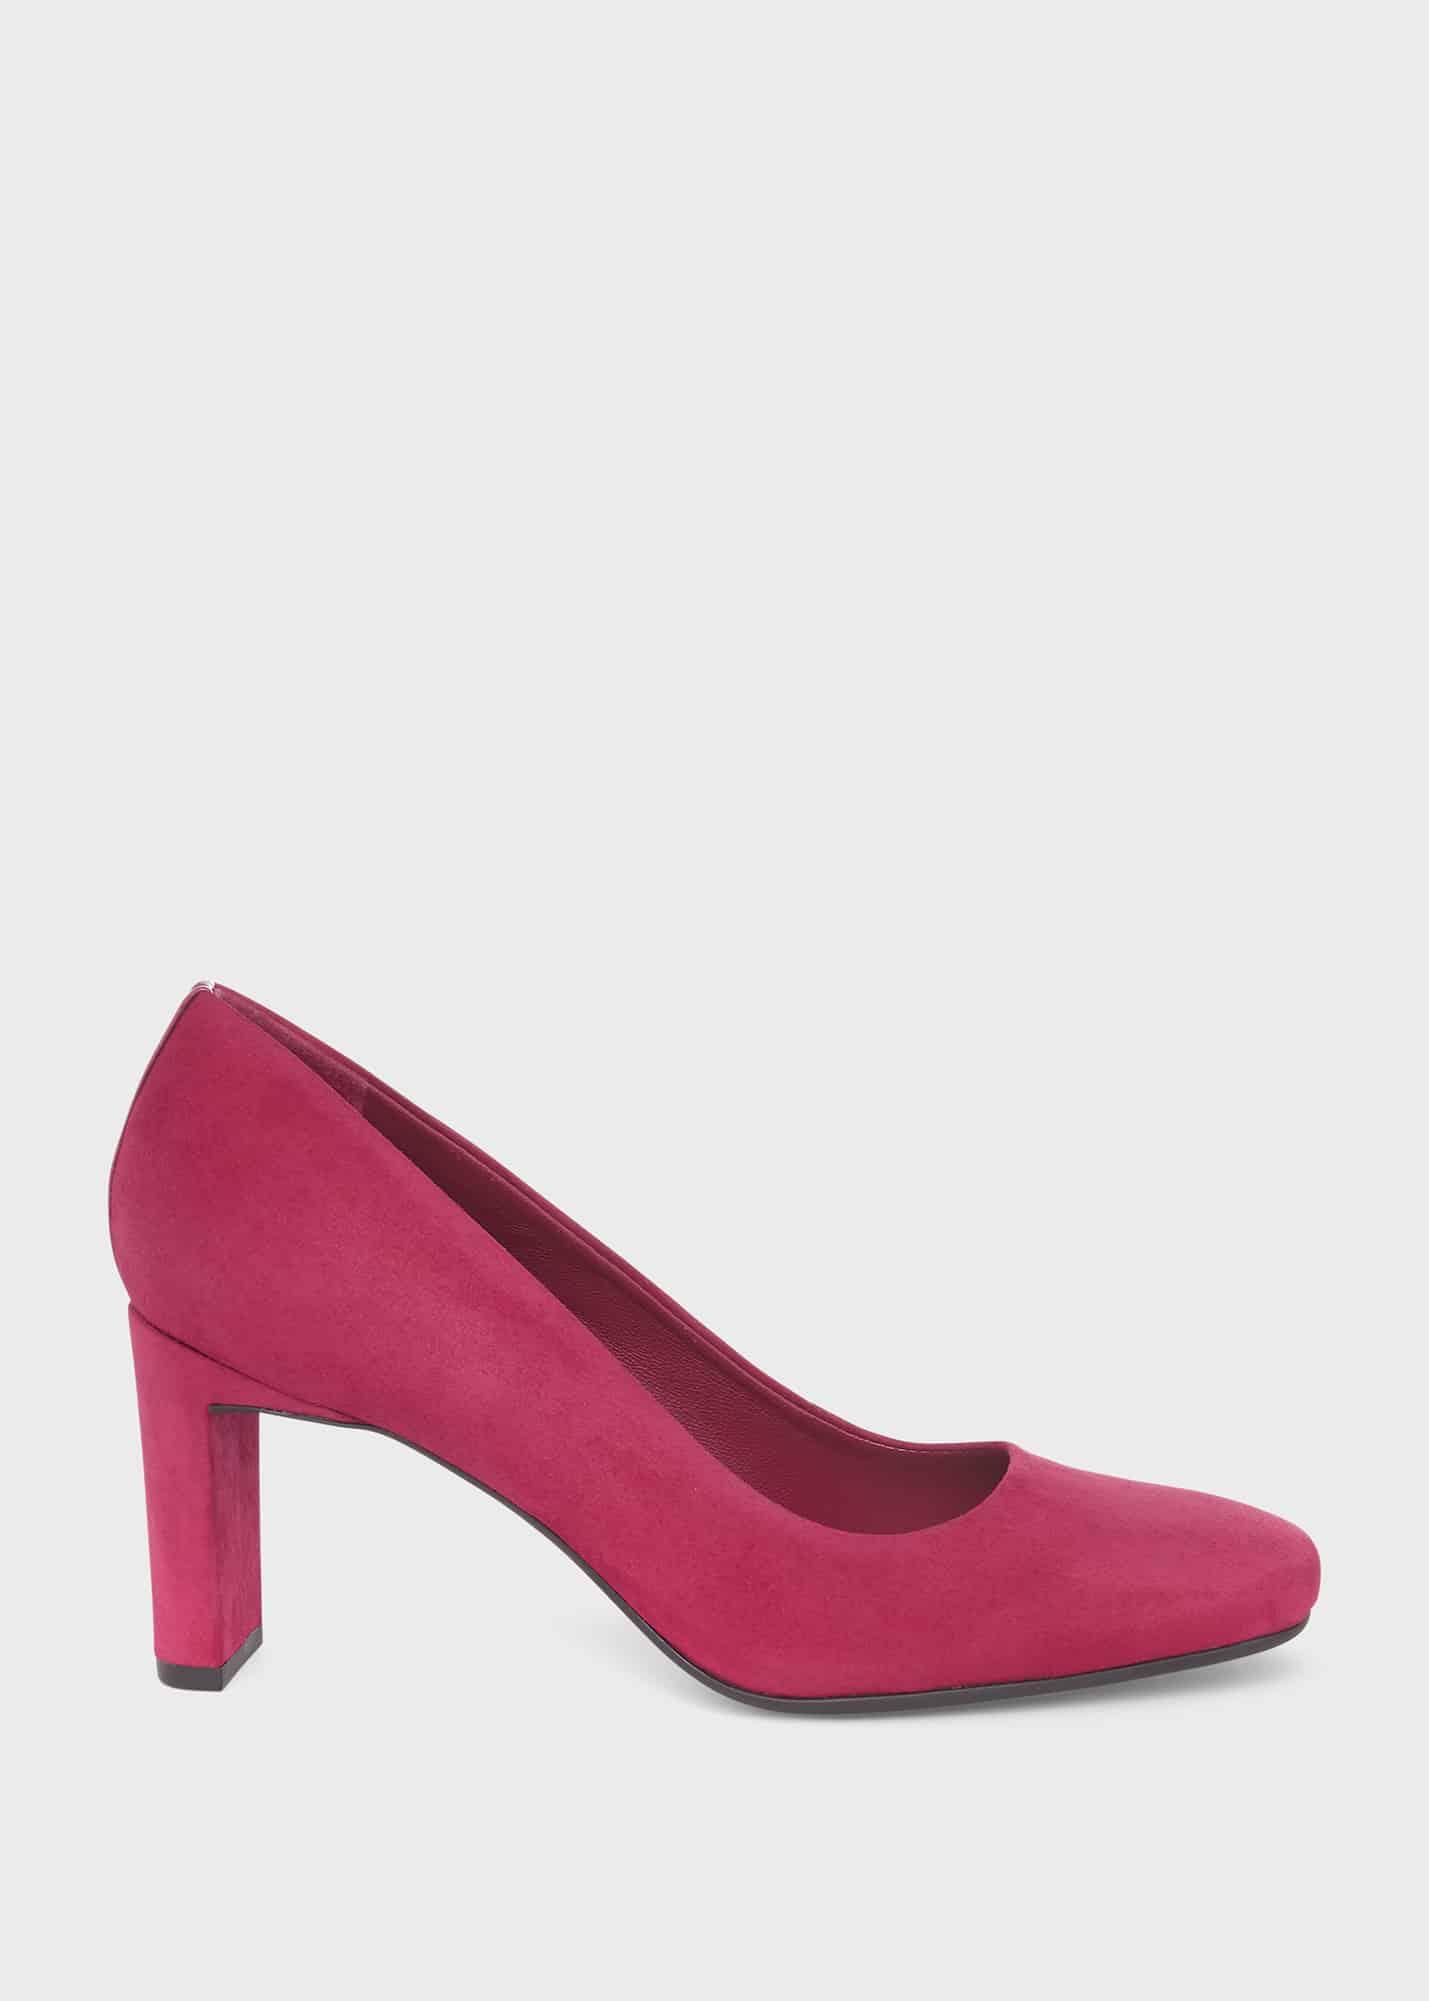 Hobbs Women Ella Suede Court Shoes